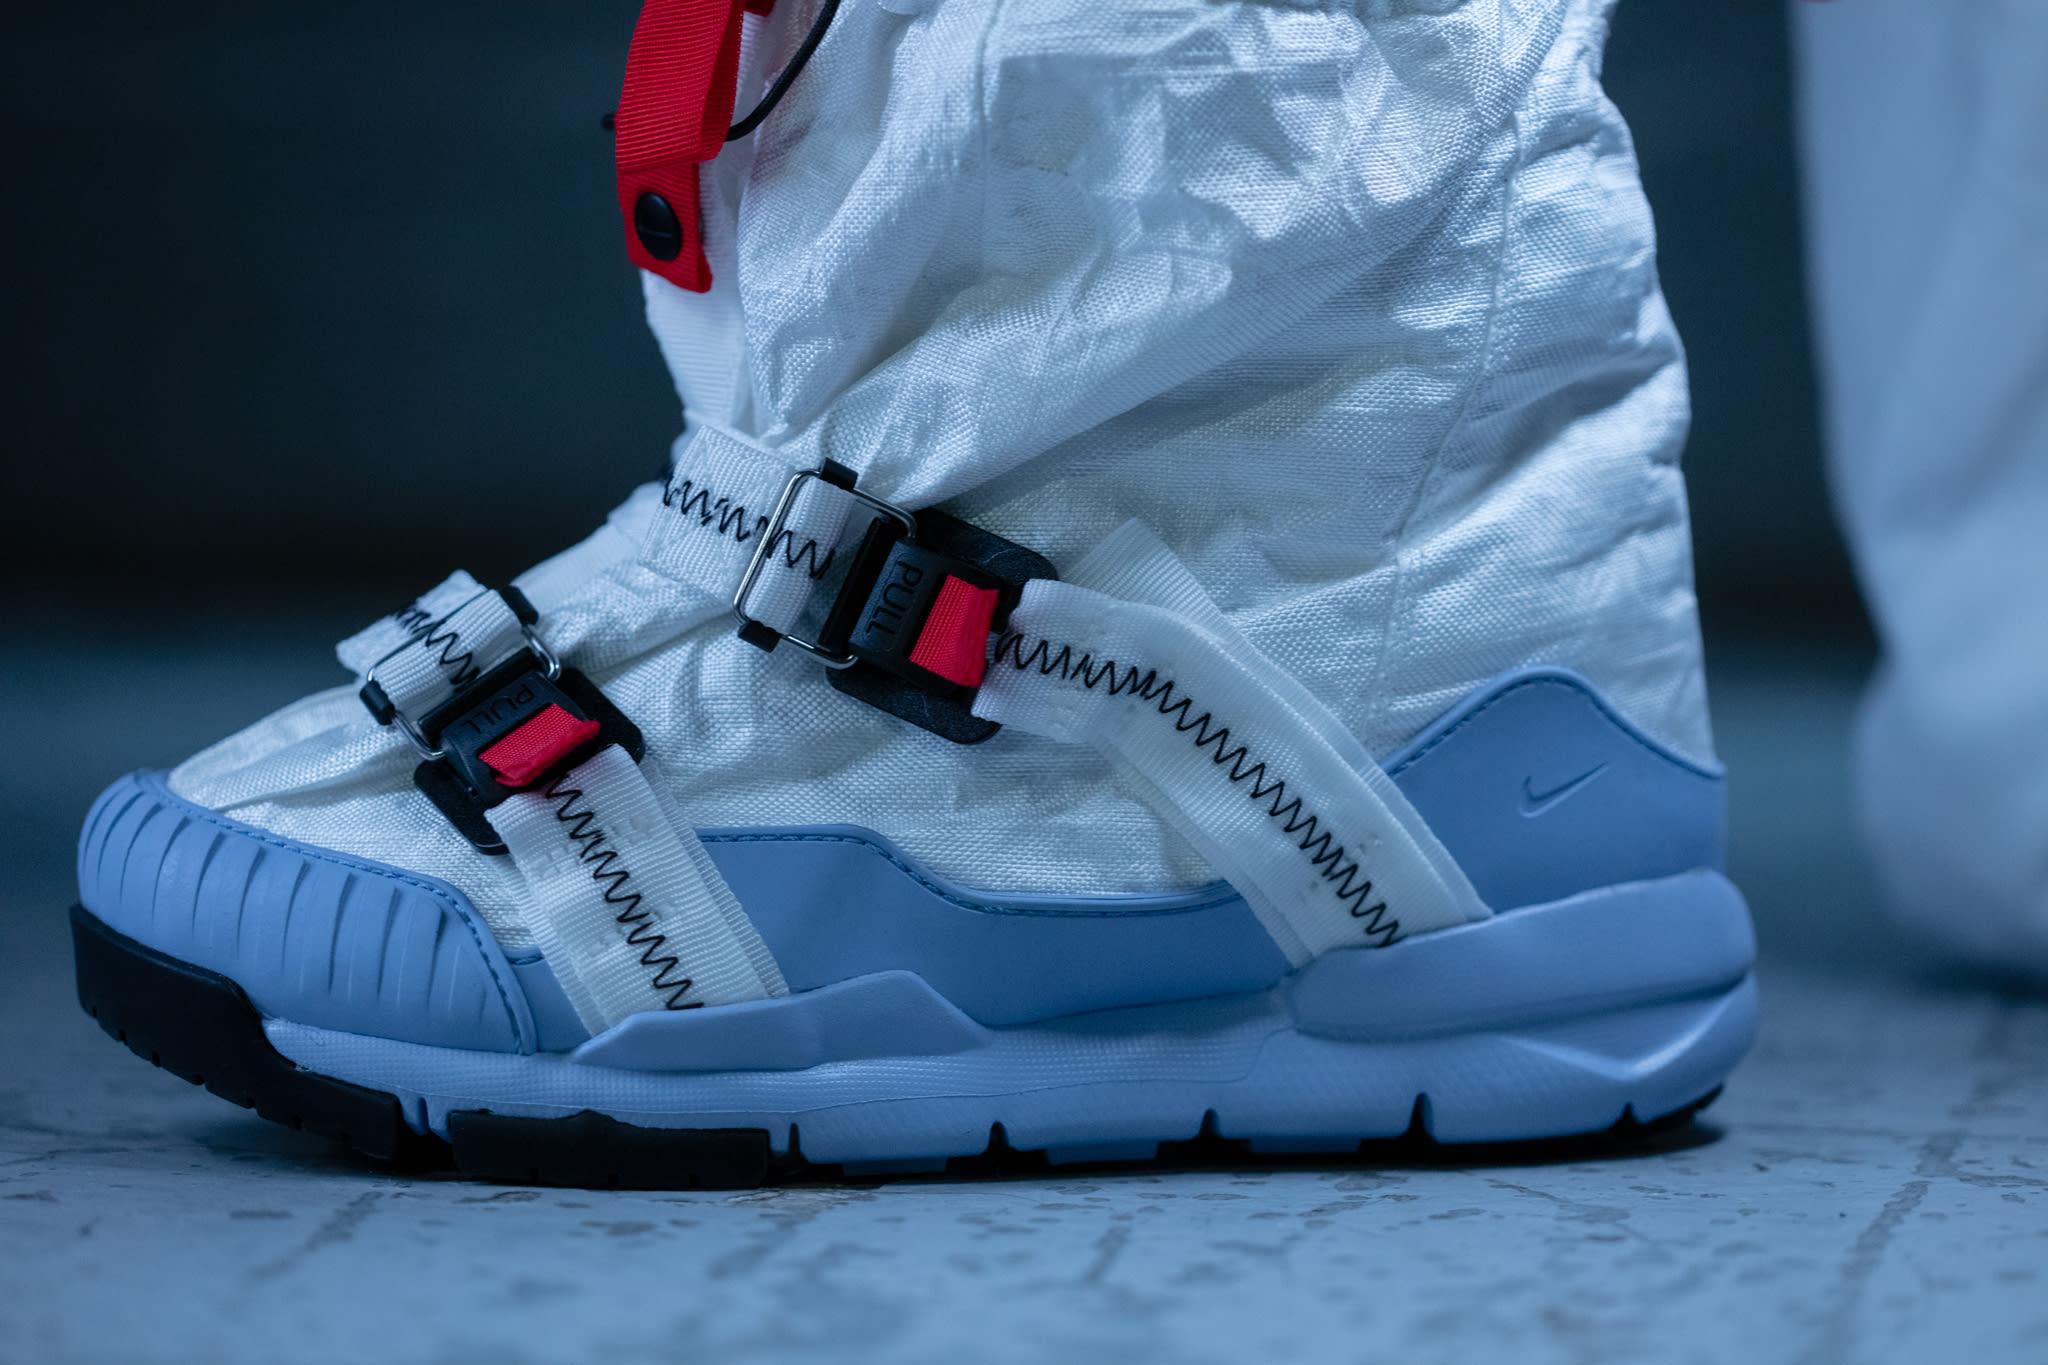 4b94a58c7 Nike x Tom Sachs Mars Yard Overshoe